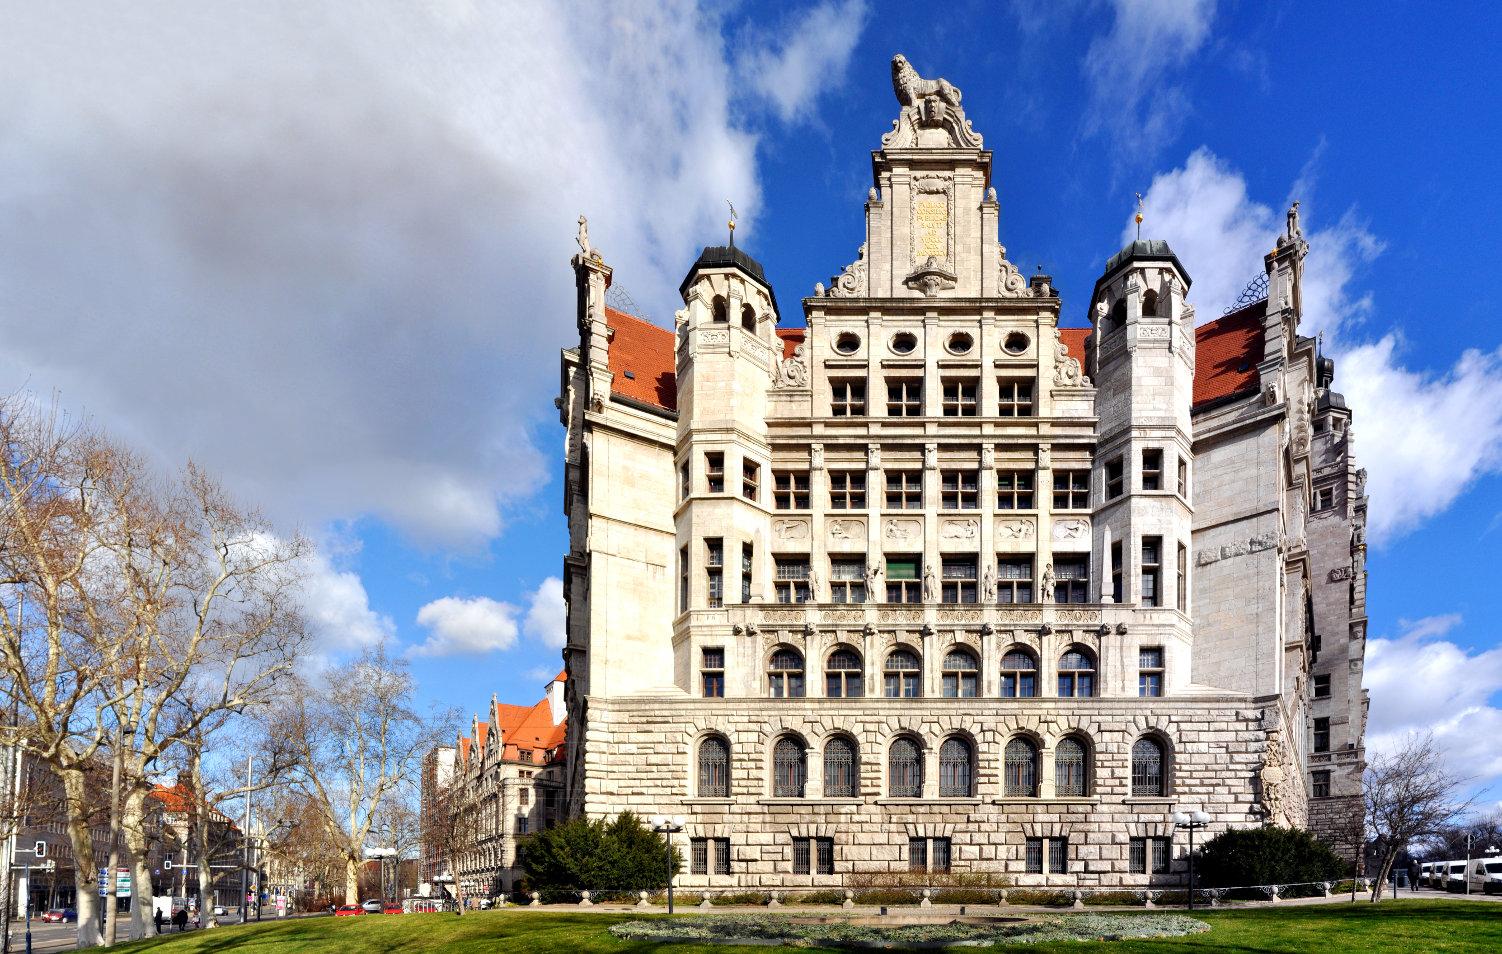 Neues Rathaus Leipzig Foto Image Bild